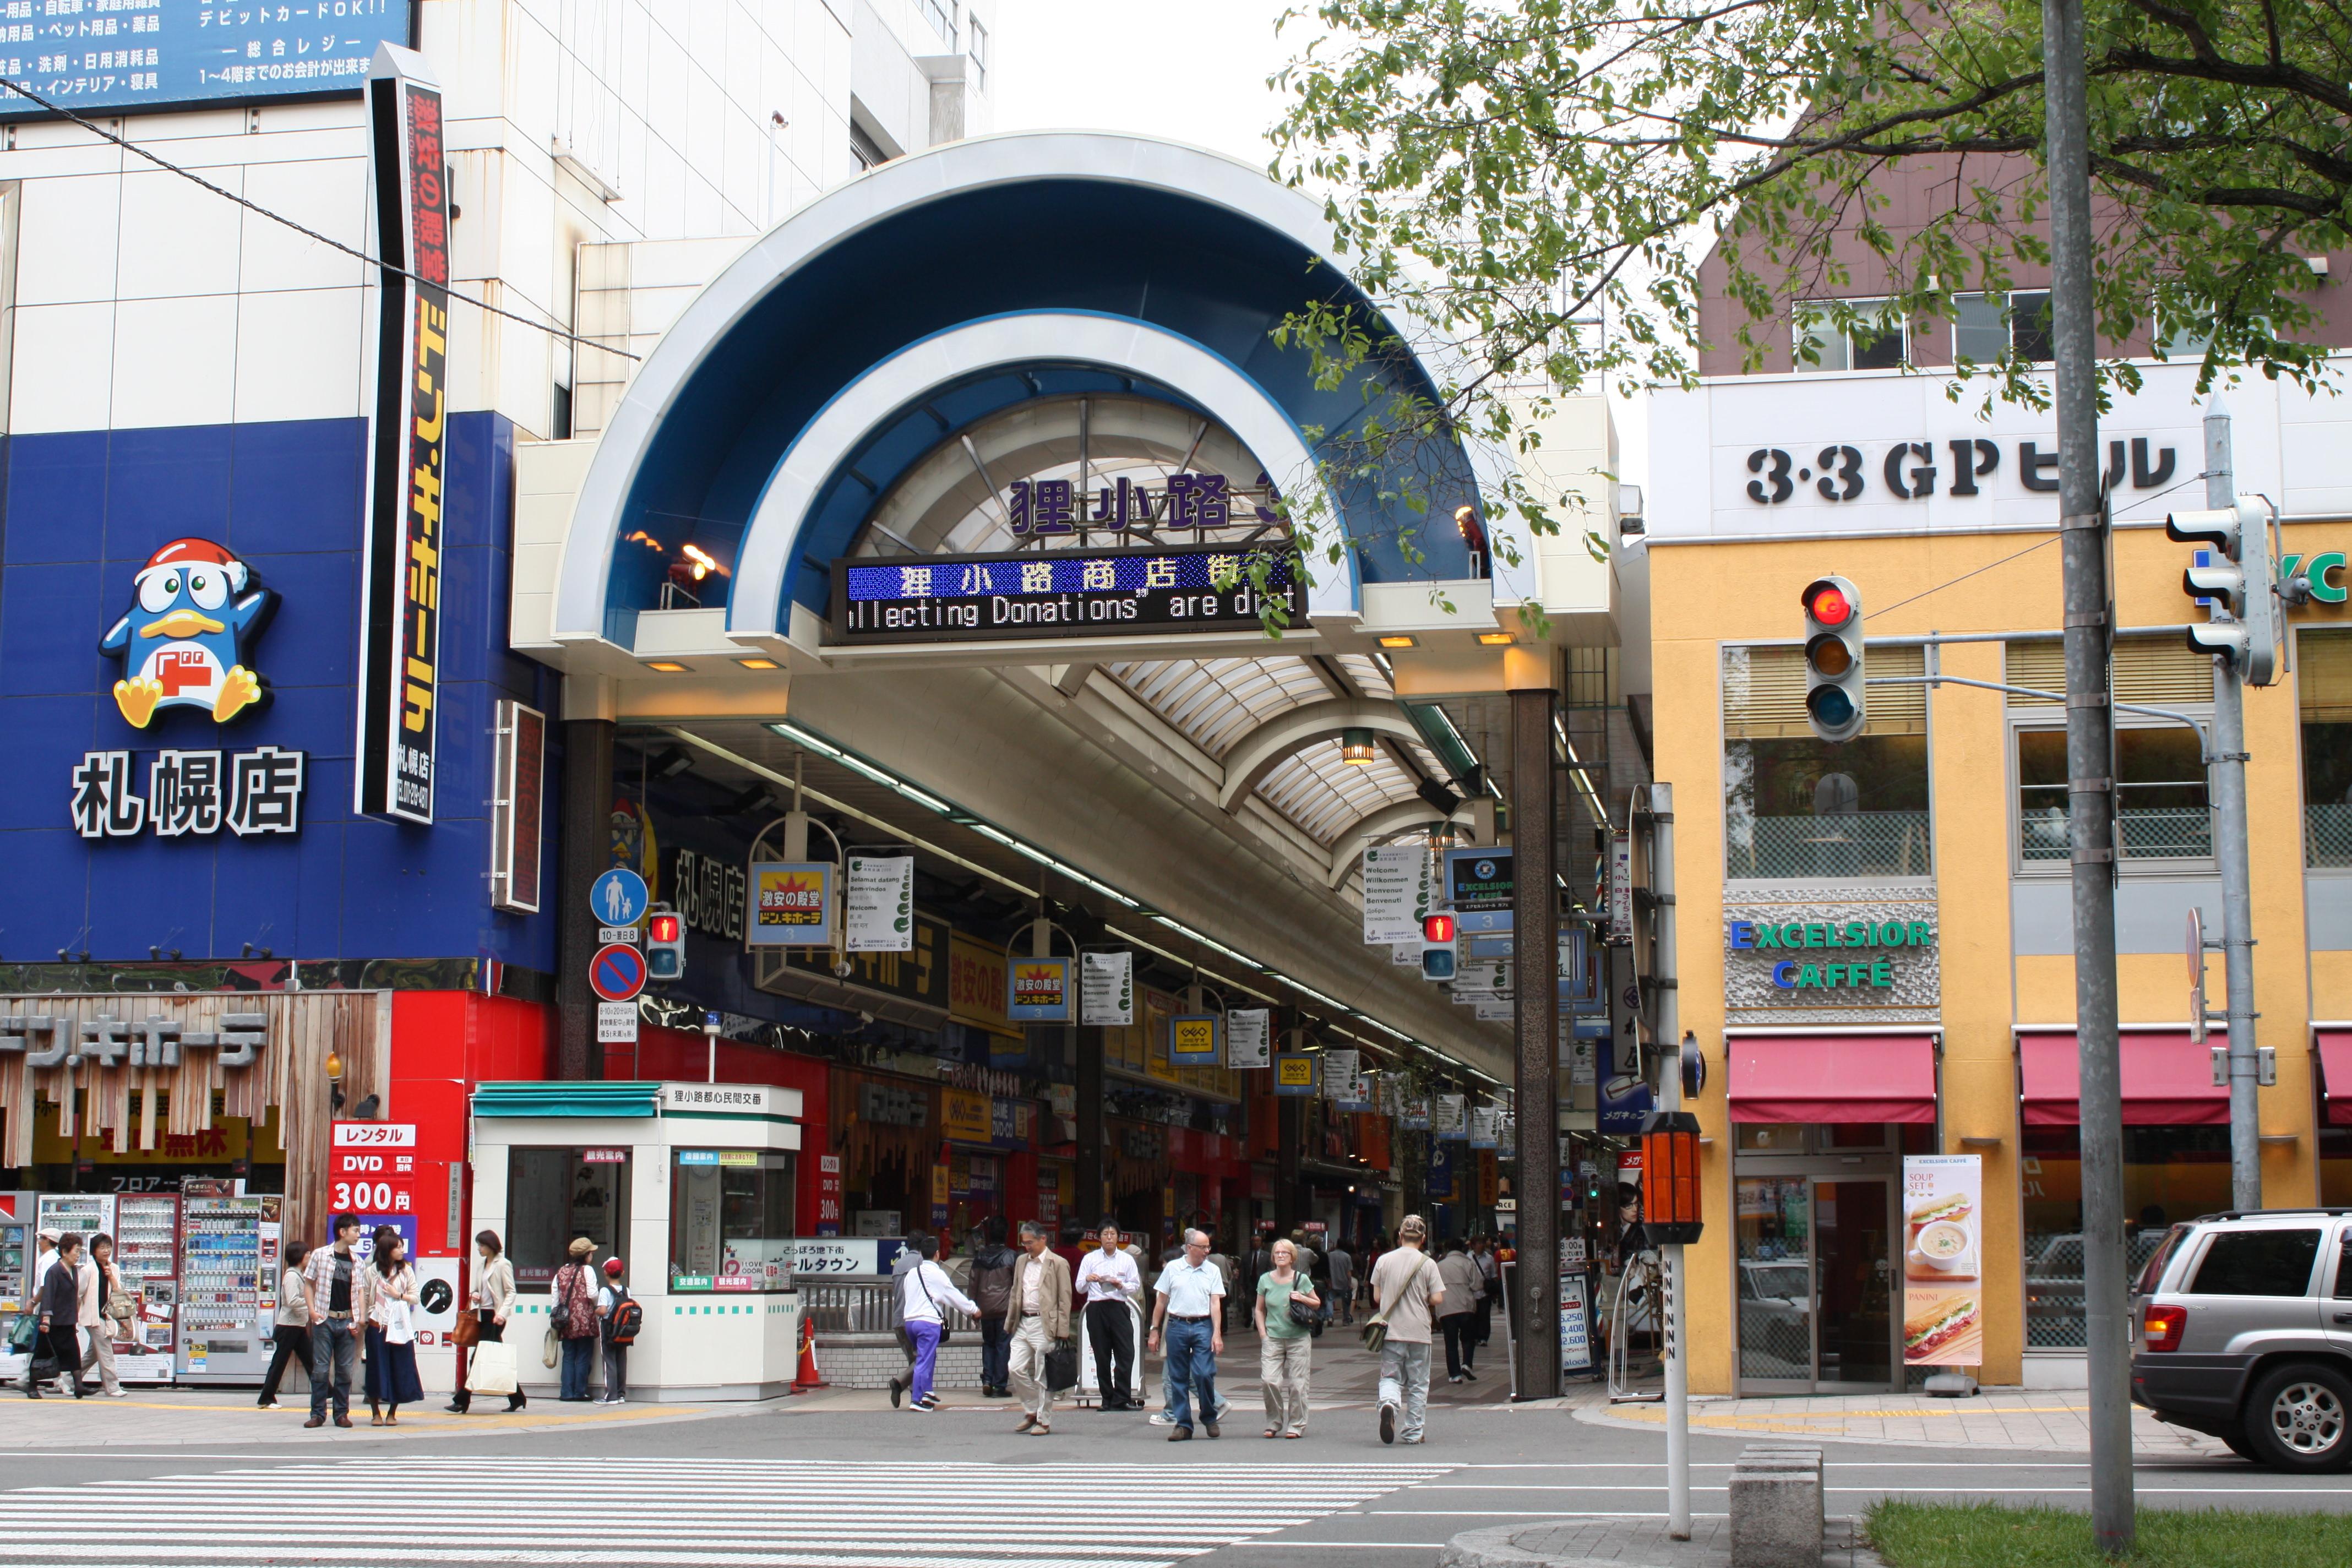 http://upload.wikimedia.org/wikipedia/commons/3/3f/Tanukikoji_01.jpg